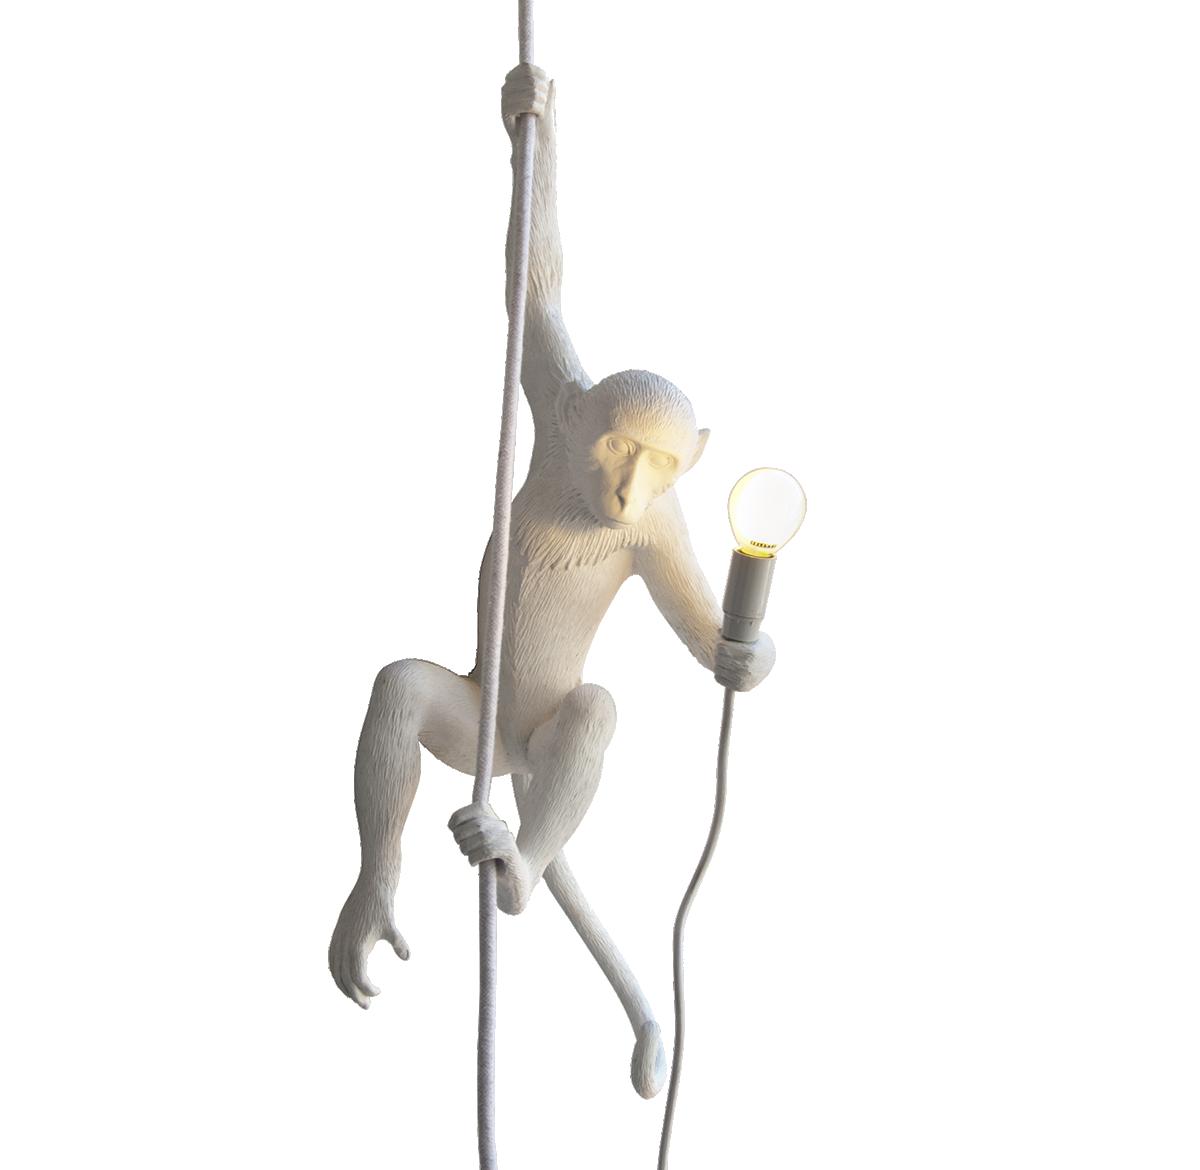 Seletti Monkey Lamp, Ceiling 0